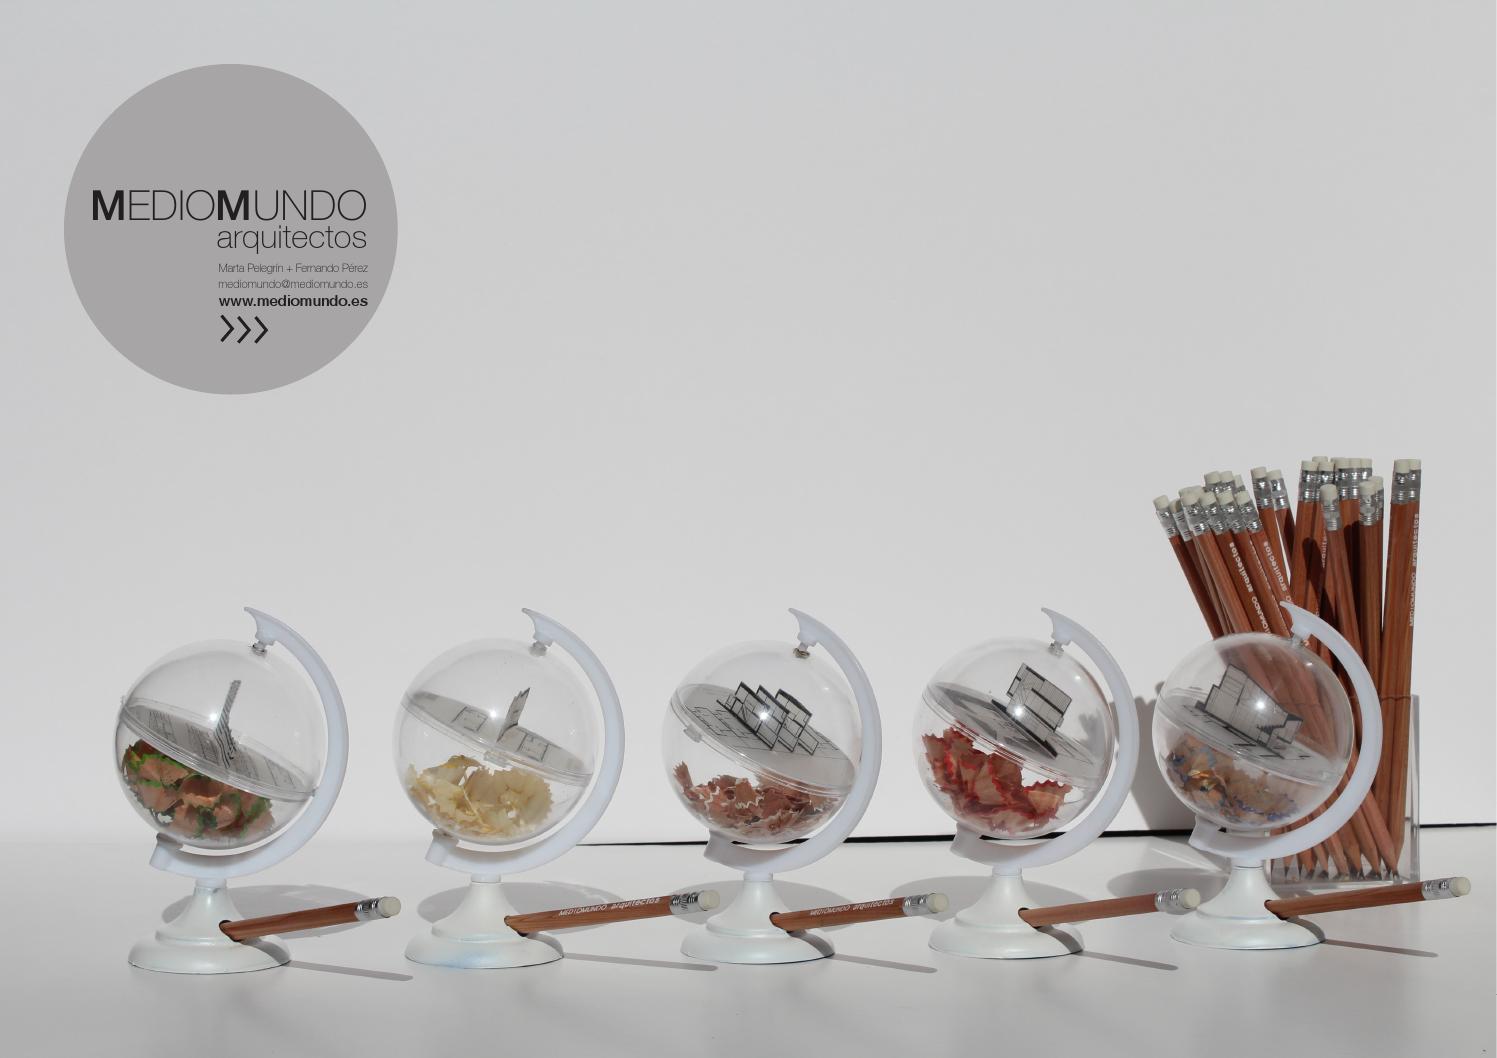 2015 Mediomundo Arquitectos Dossier Bim Issuu By Mediomundo  # Champagne Muebles Uy